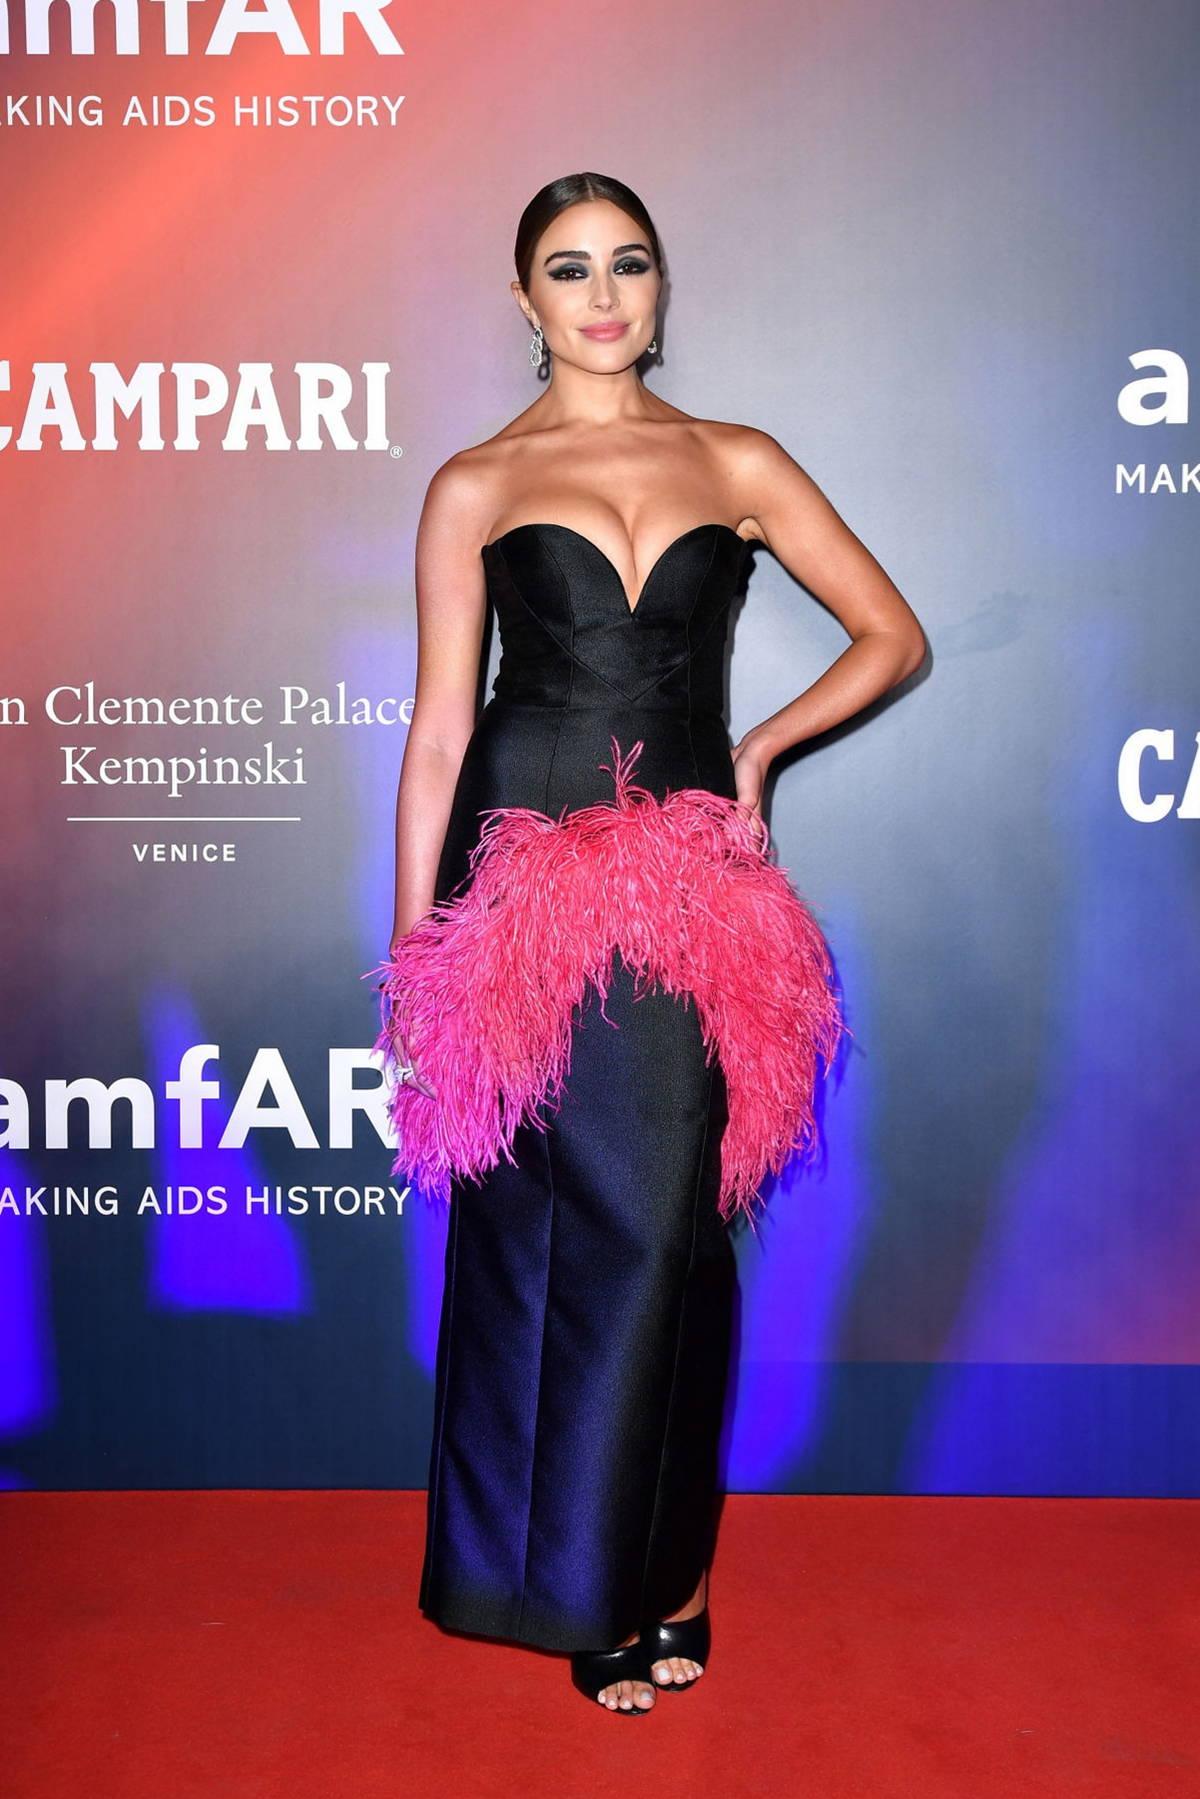 Olivia Culpo attends the 2021 amfAR Gala during the 78th Venice International Film Festival in Venice, Italy